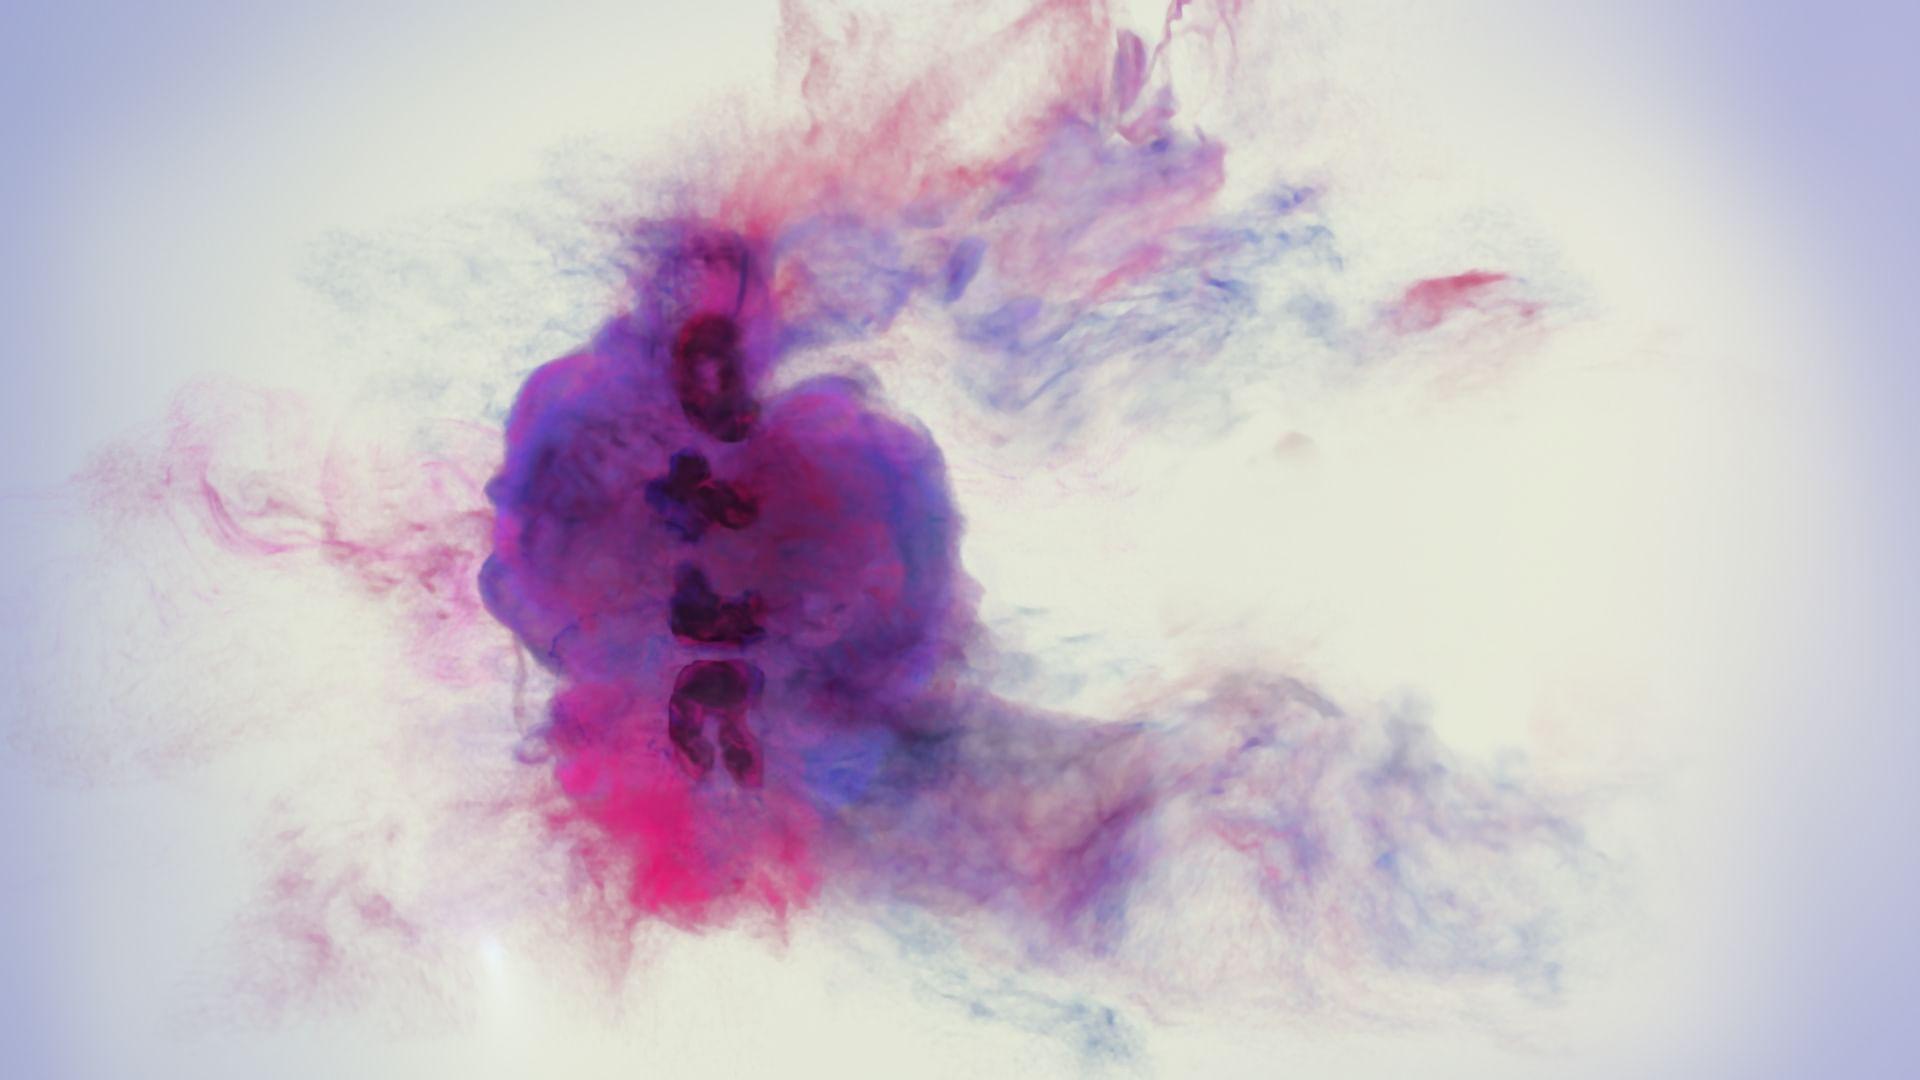 Loulou (2/11)